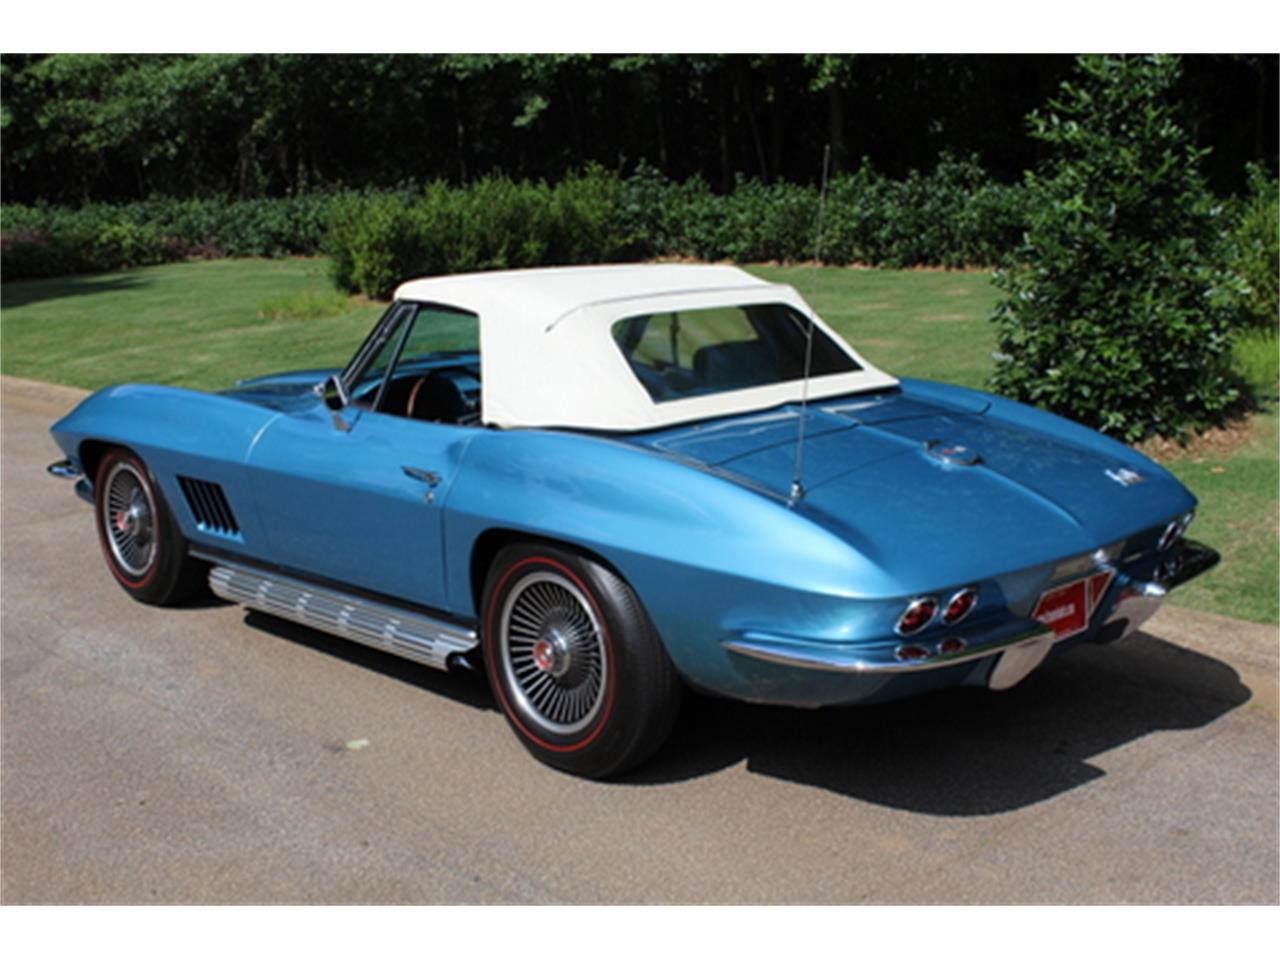 Large Picture of Classic '67 Corvette - $110,000.00 - Q5DT